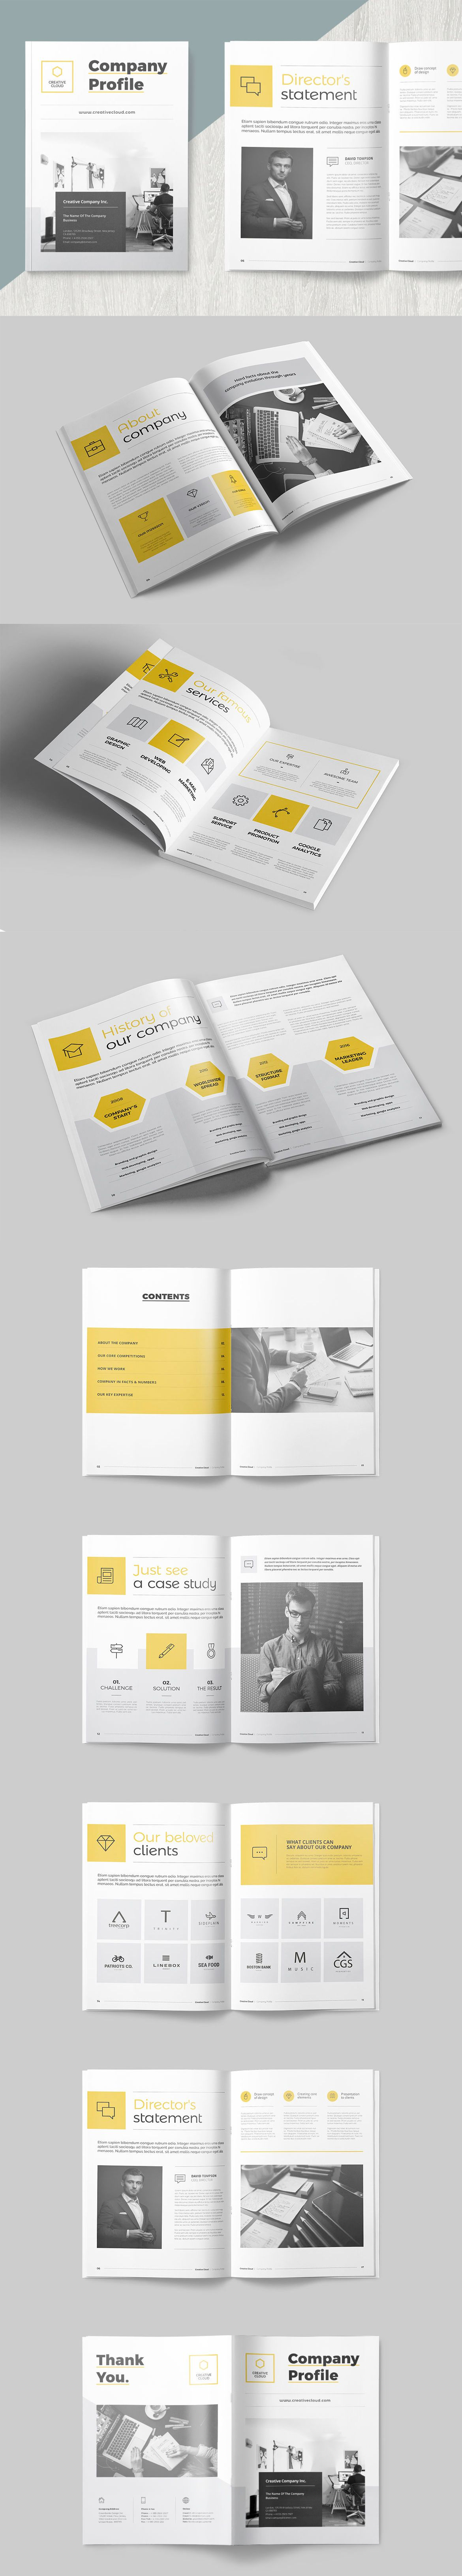 Client Background PowerPoint Slide Design   SlideModel